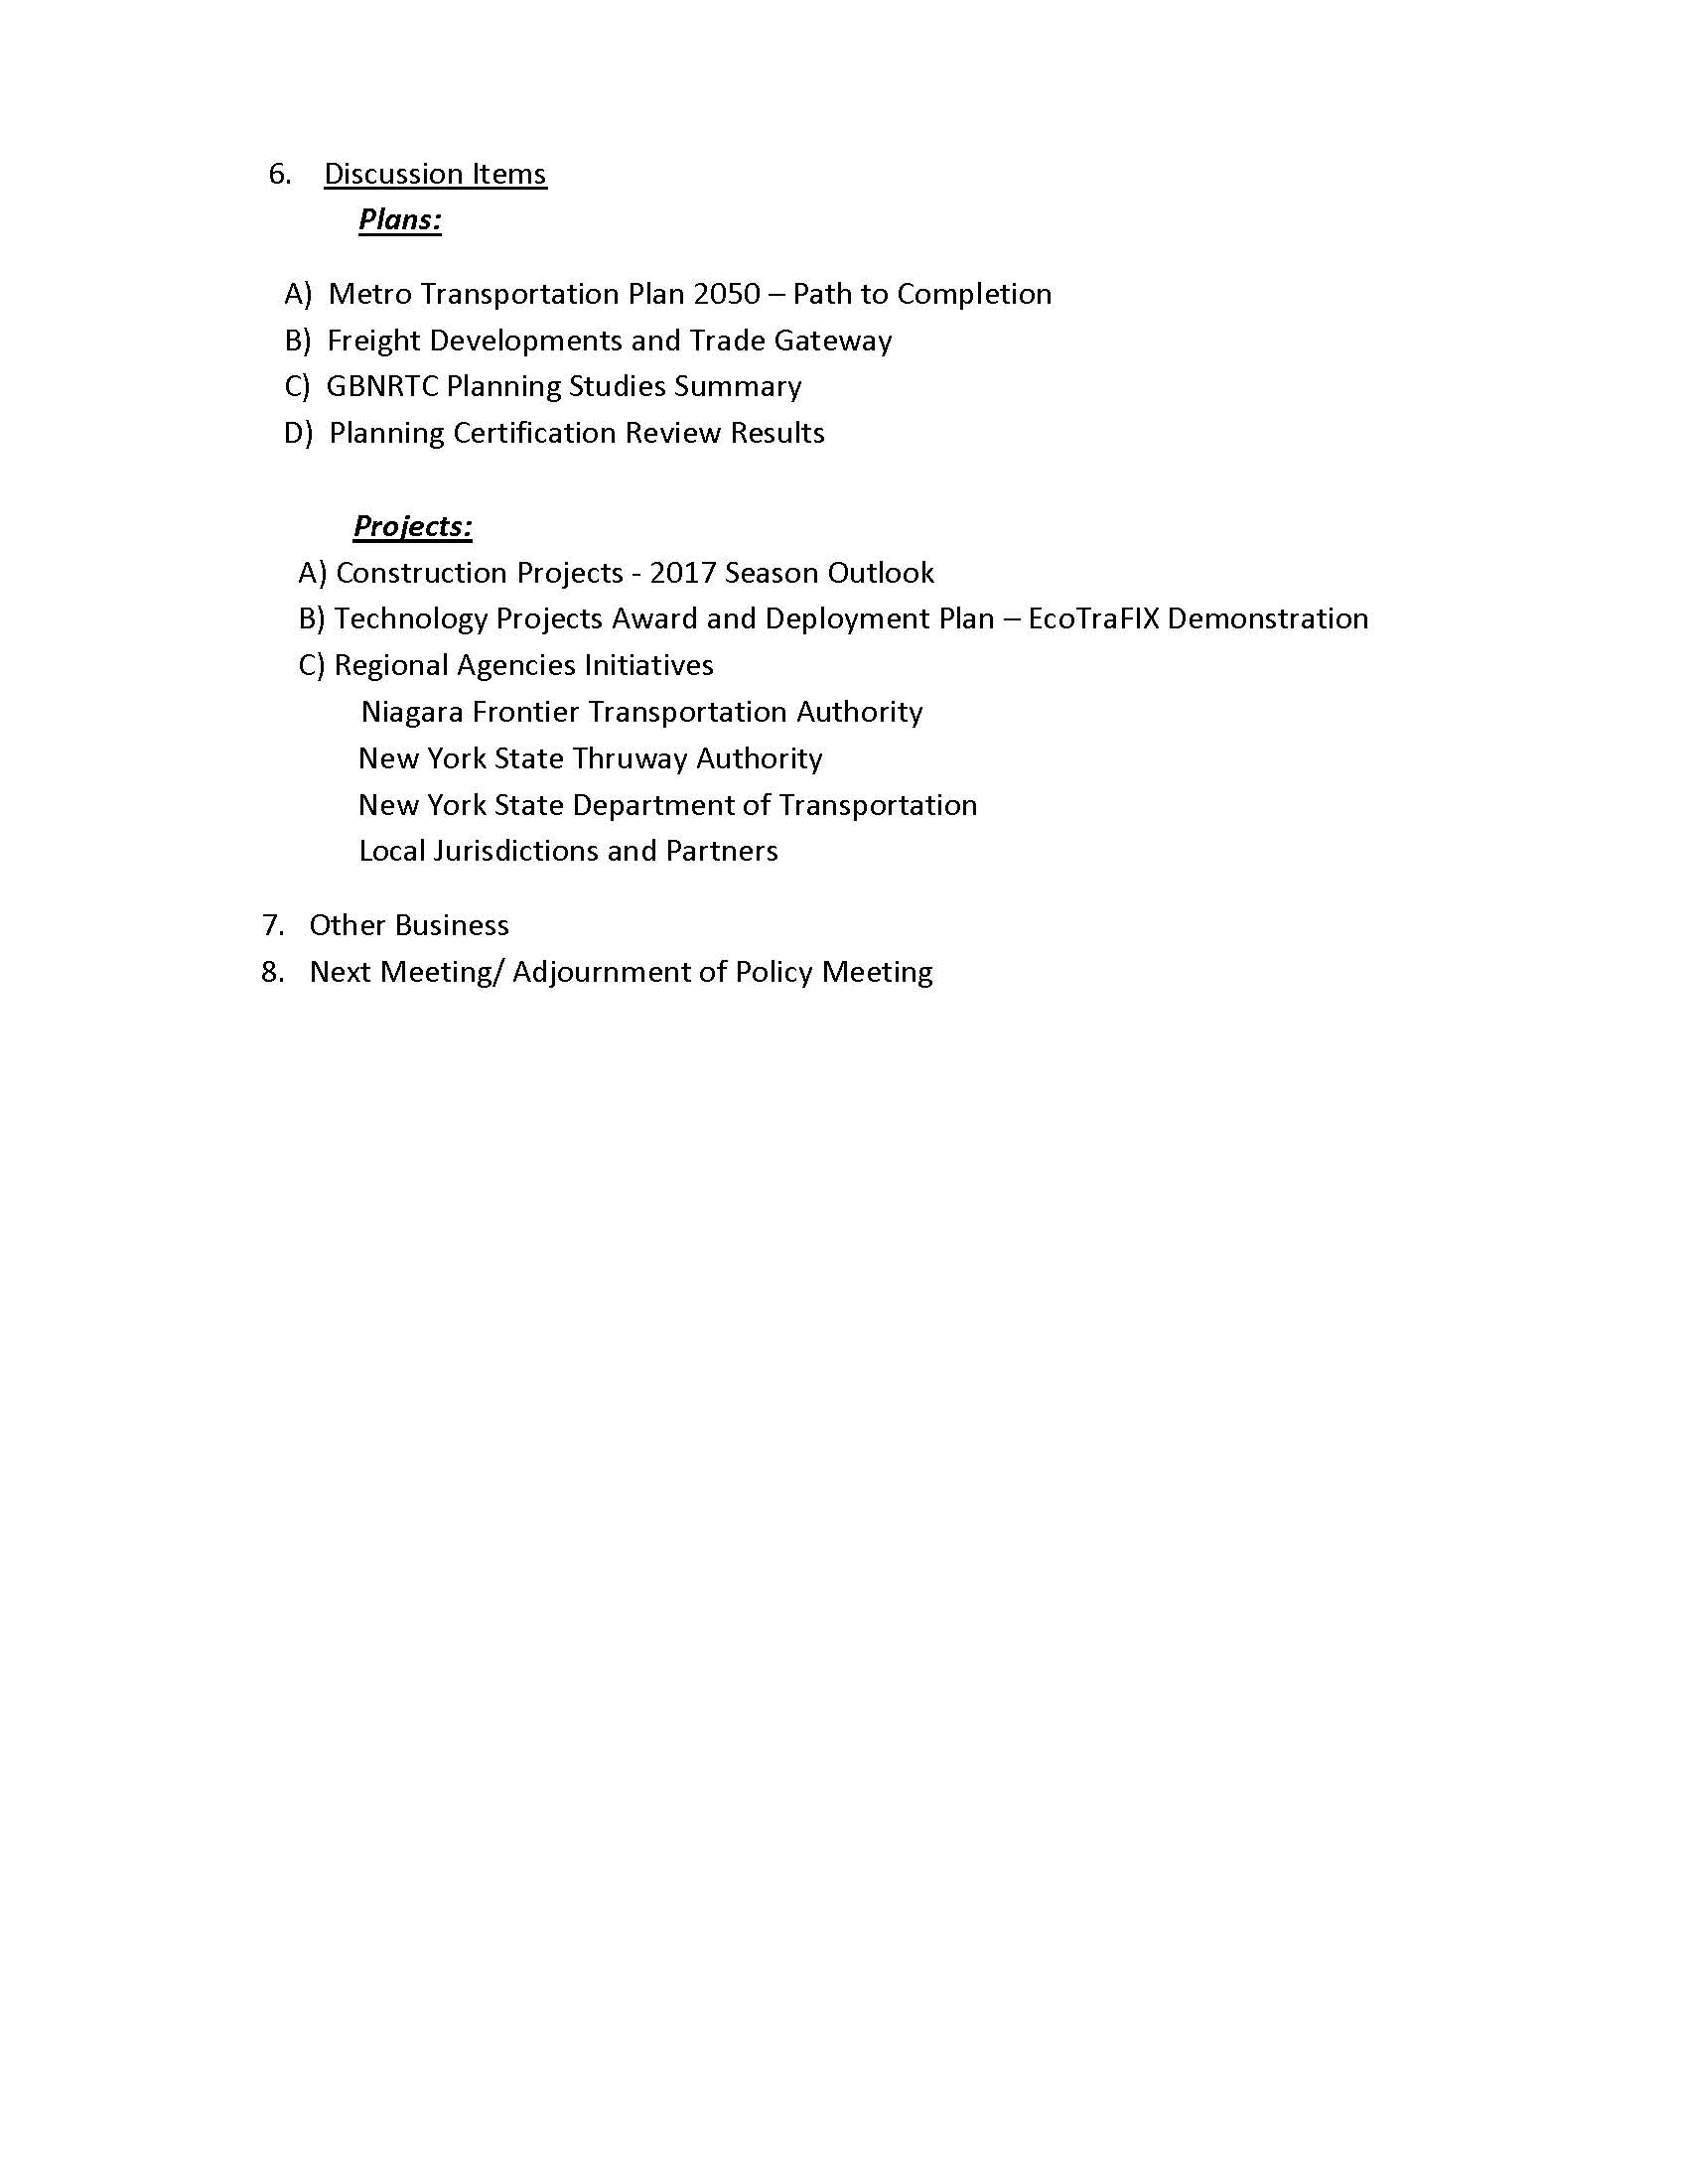 Policy Committee Draft Agenda June 12, 2017_Page_2.jpg